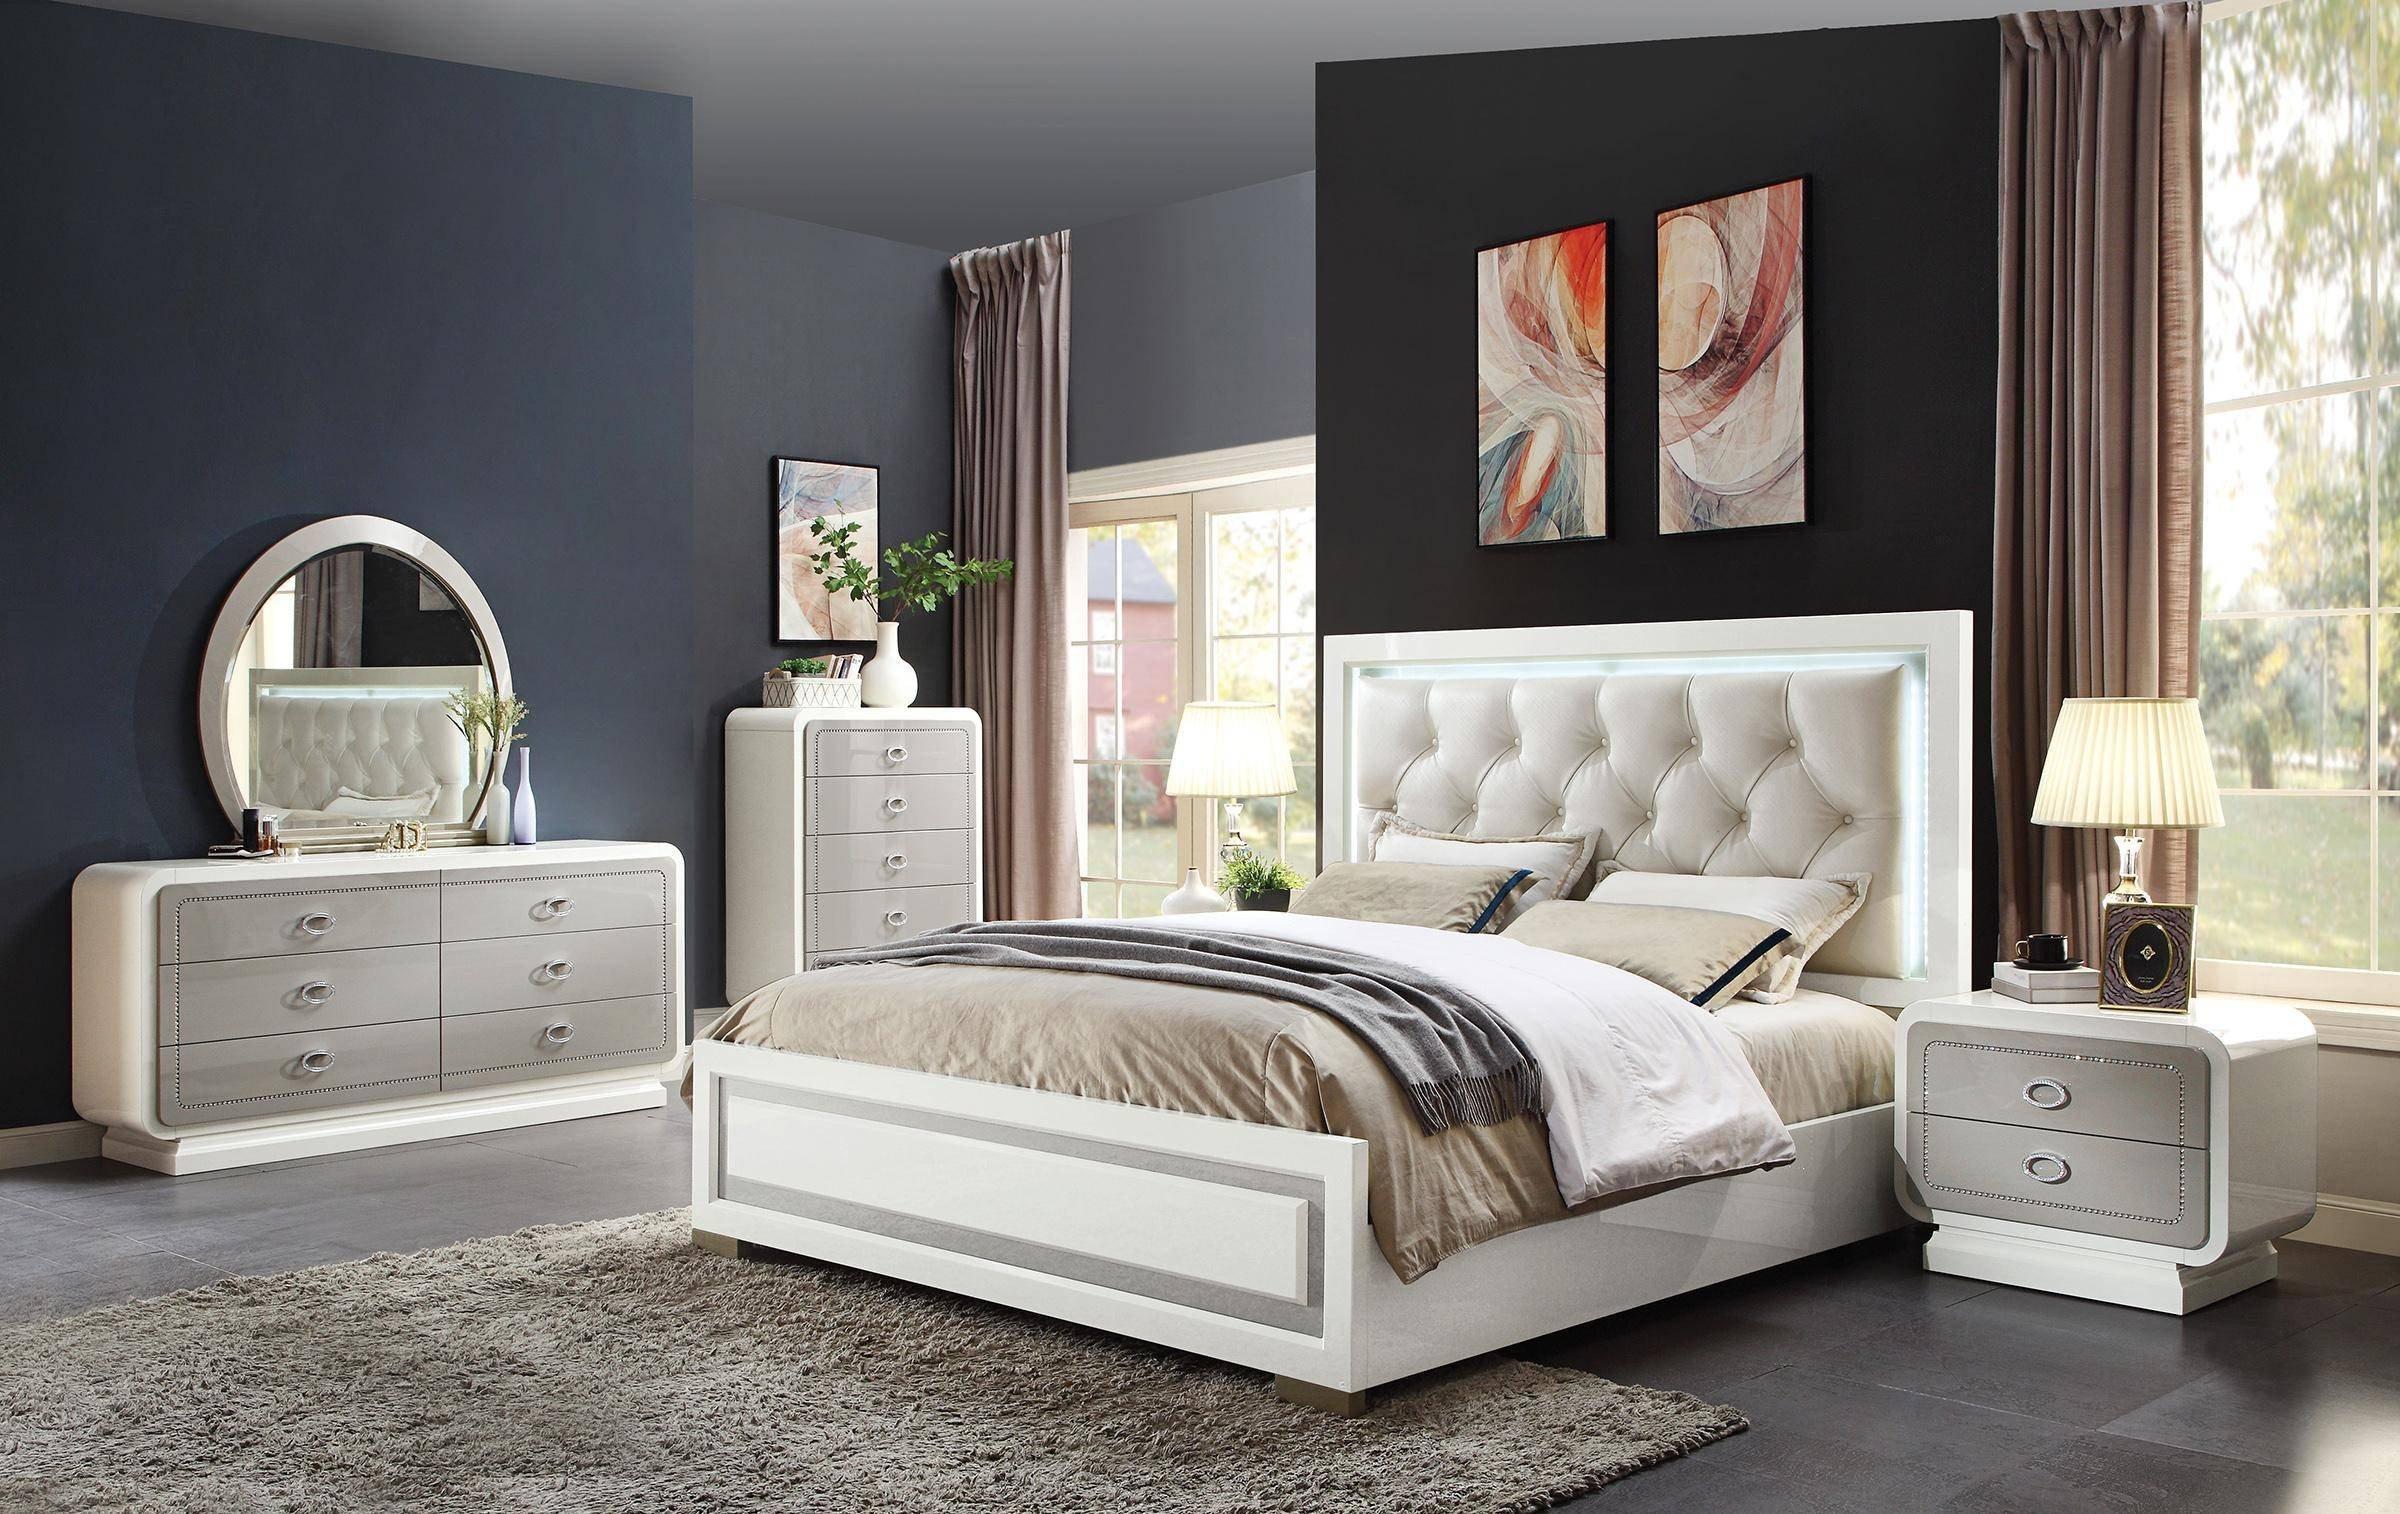 Cheap Queen Bedroom Set Elegant Glam Ivory & Latte High Gloss Queen Bedroom Set 5pcs